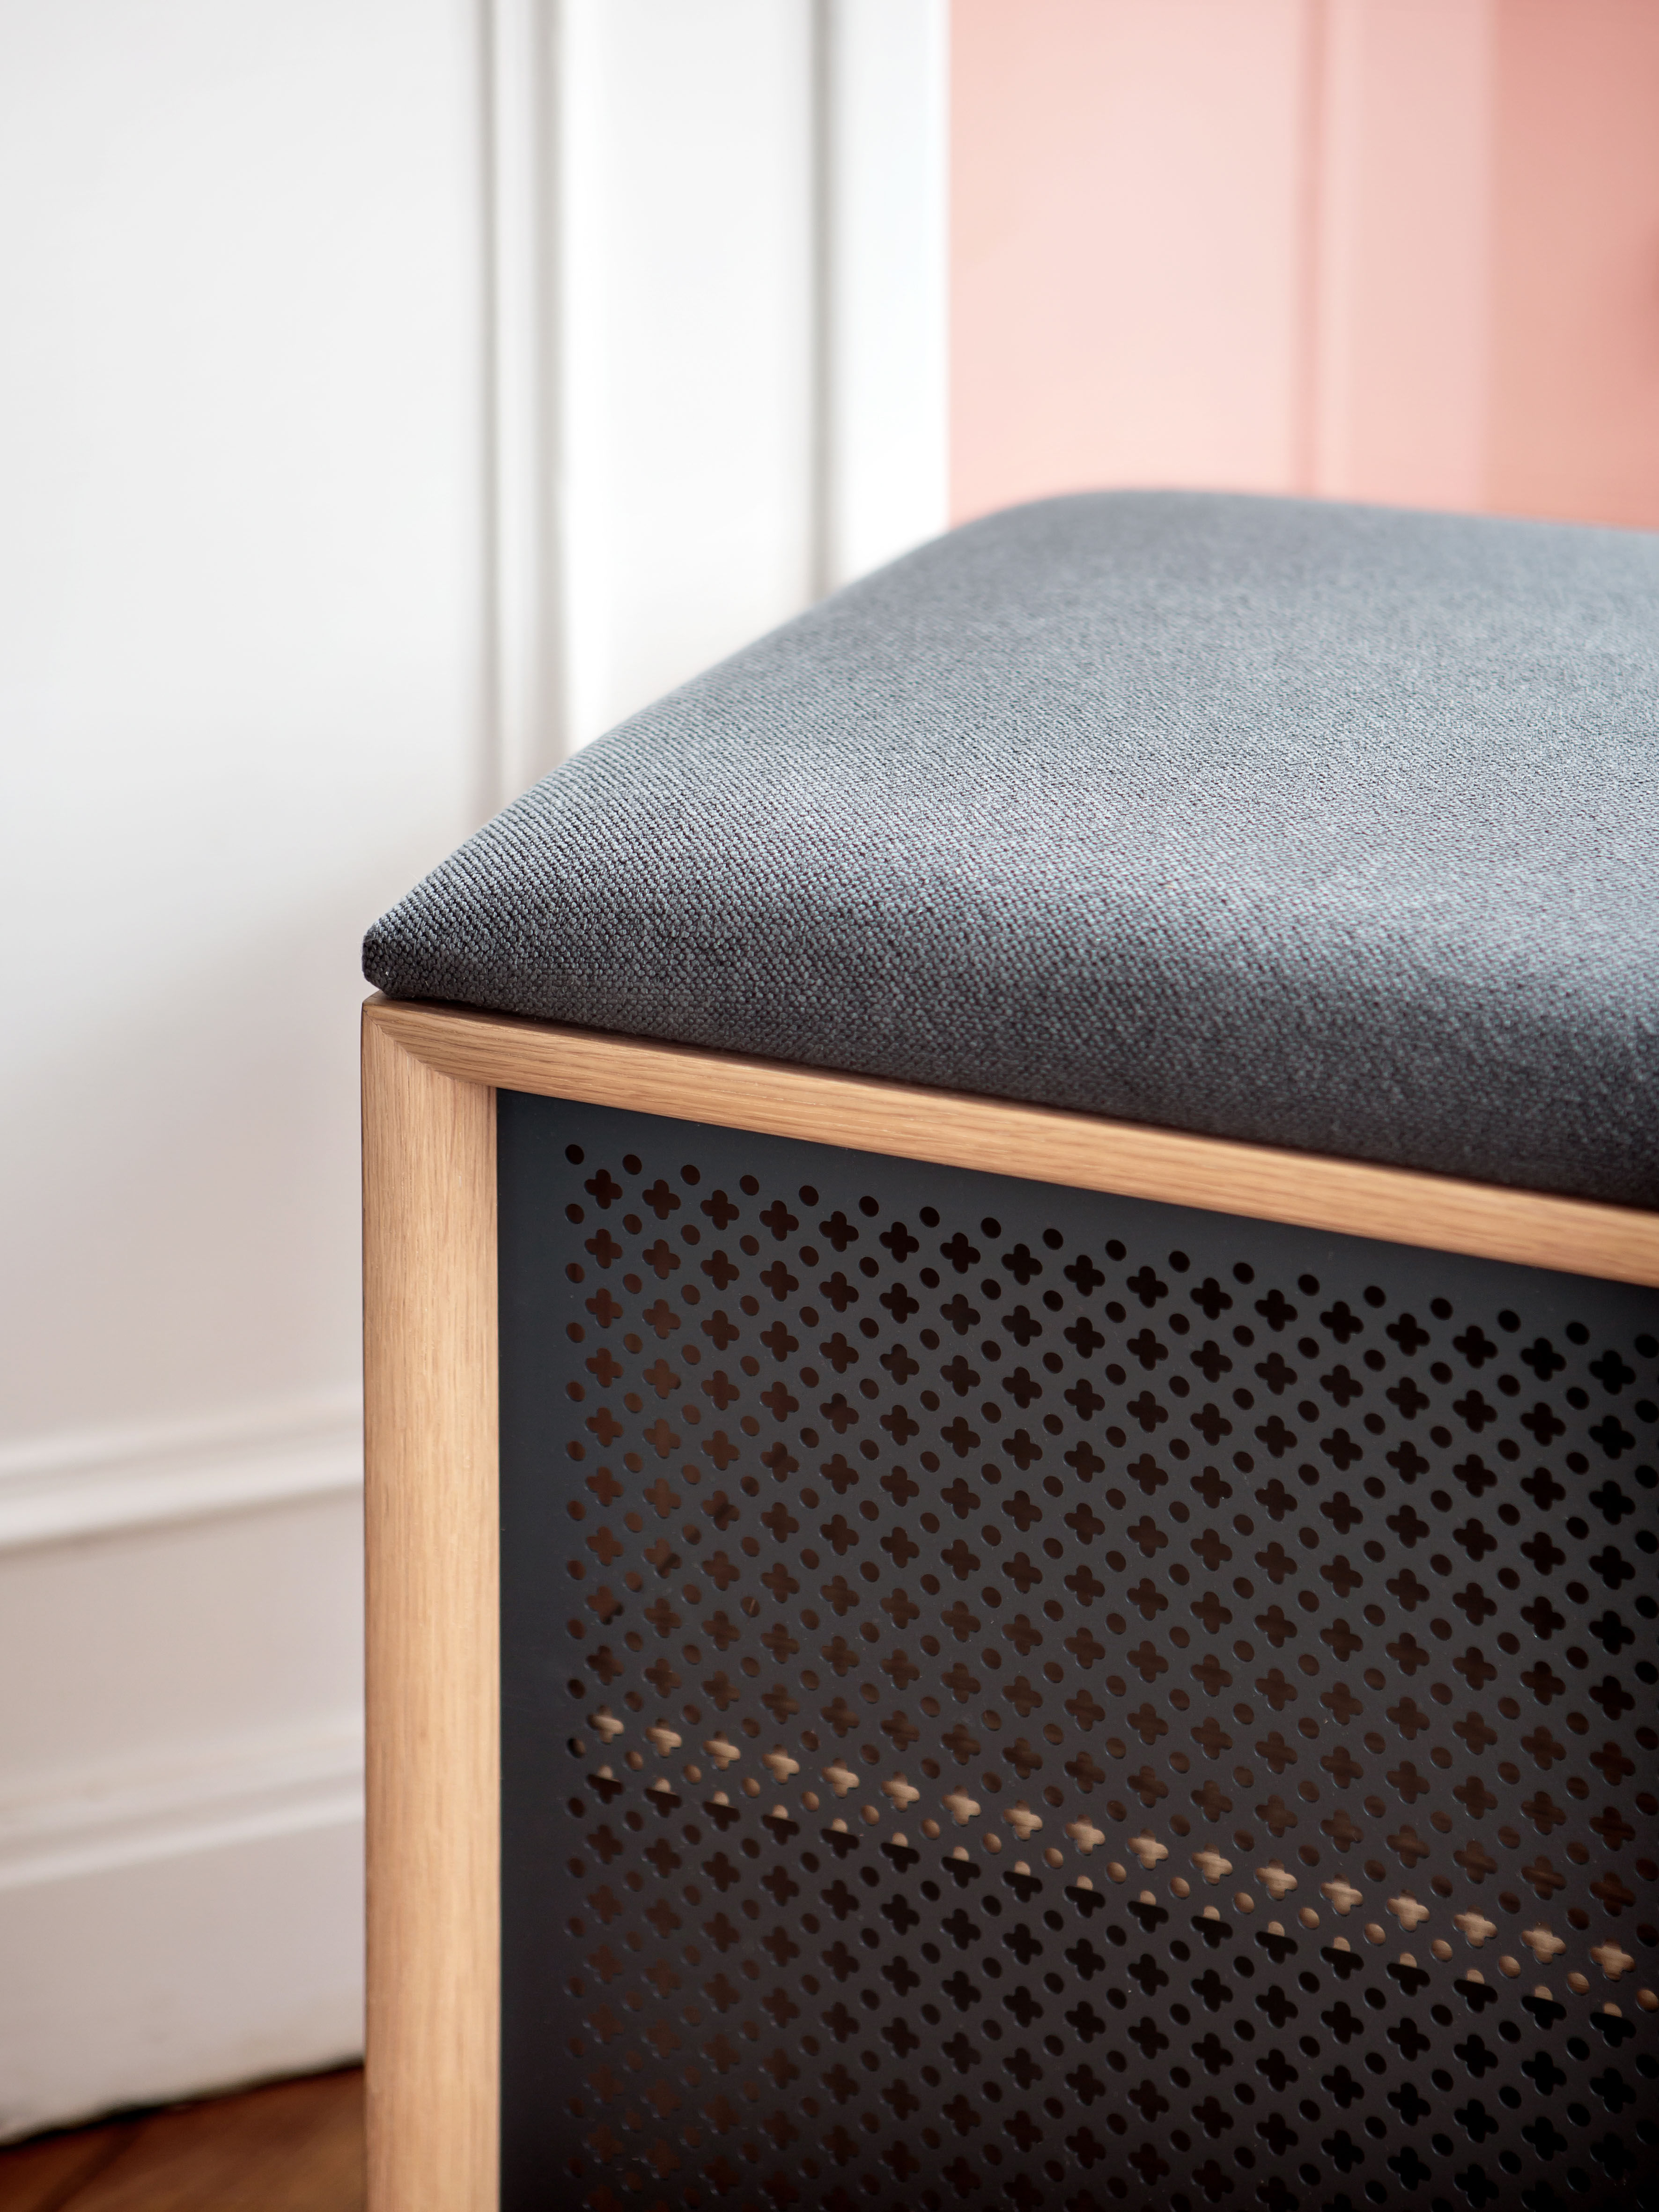 Panchina gabin di hart grigio made in design for Arredamento made in china